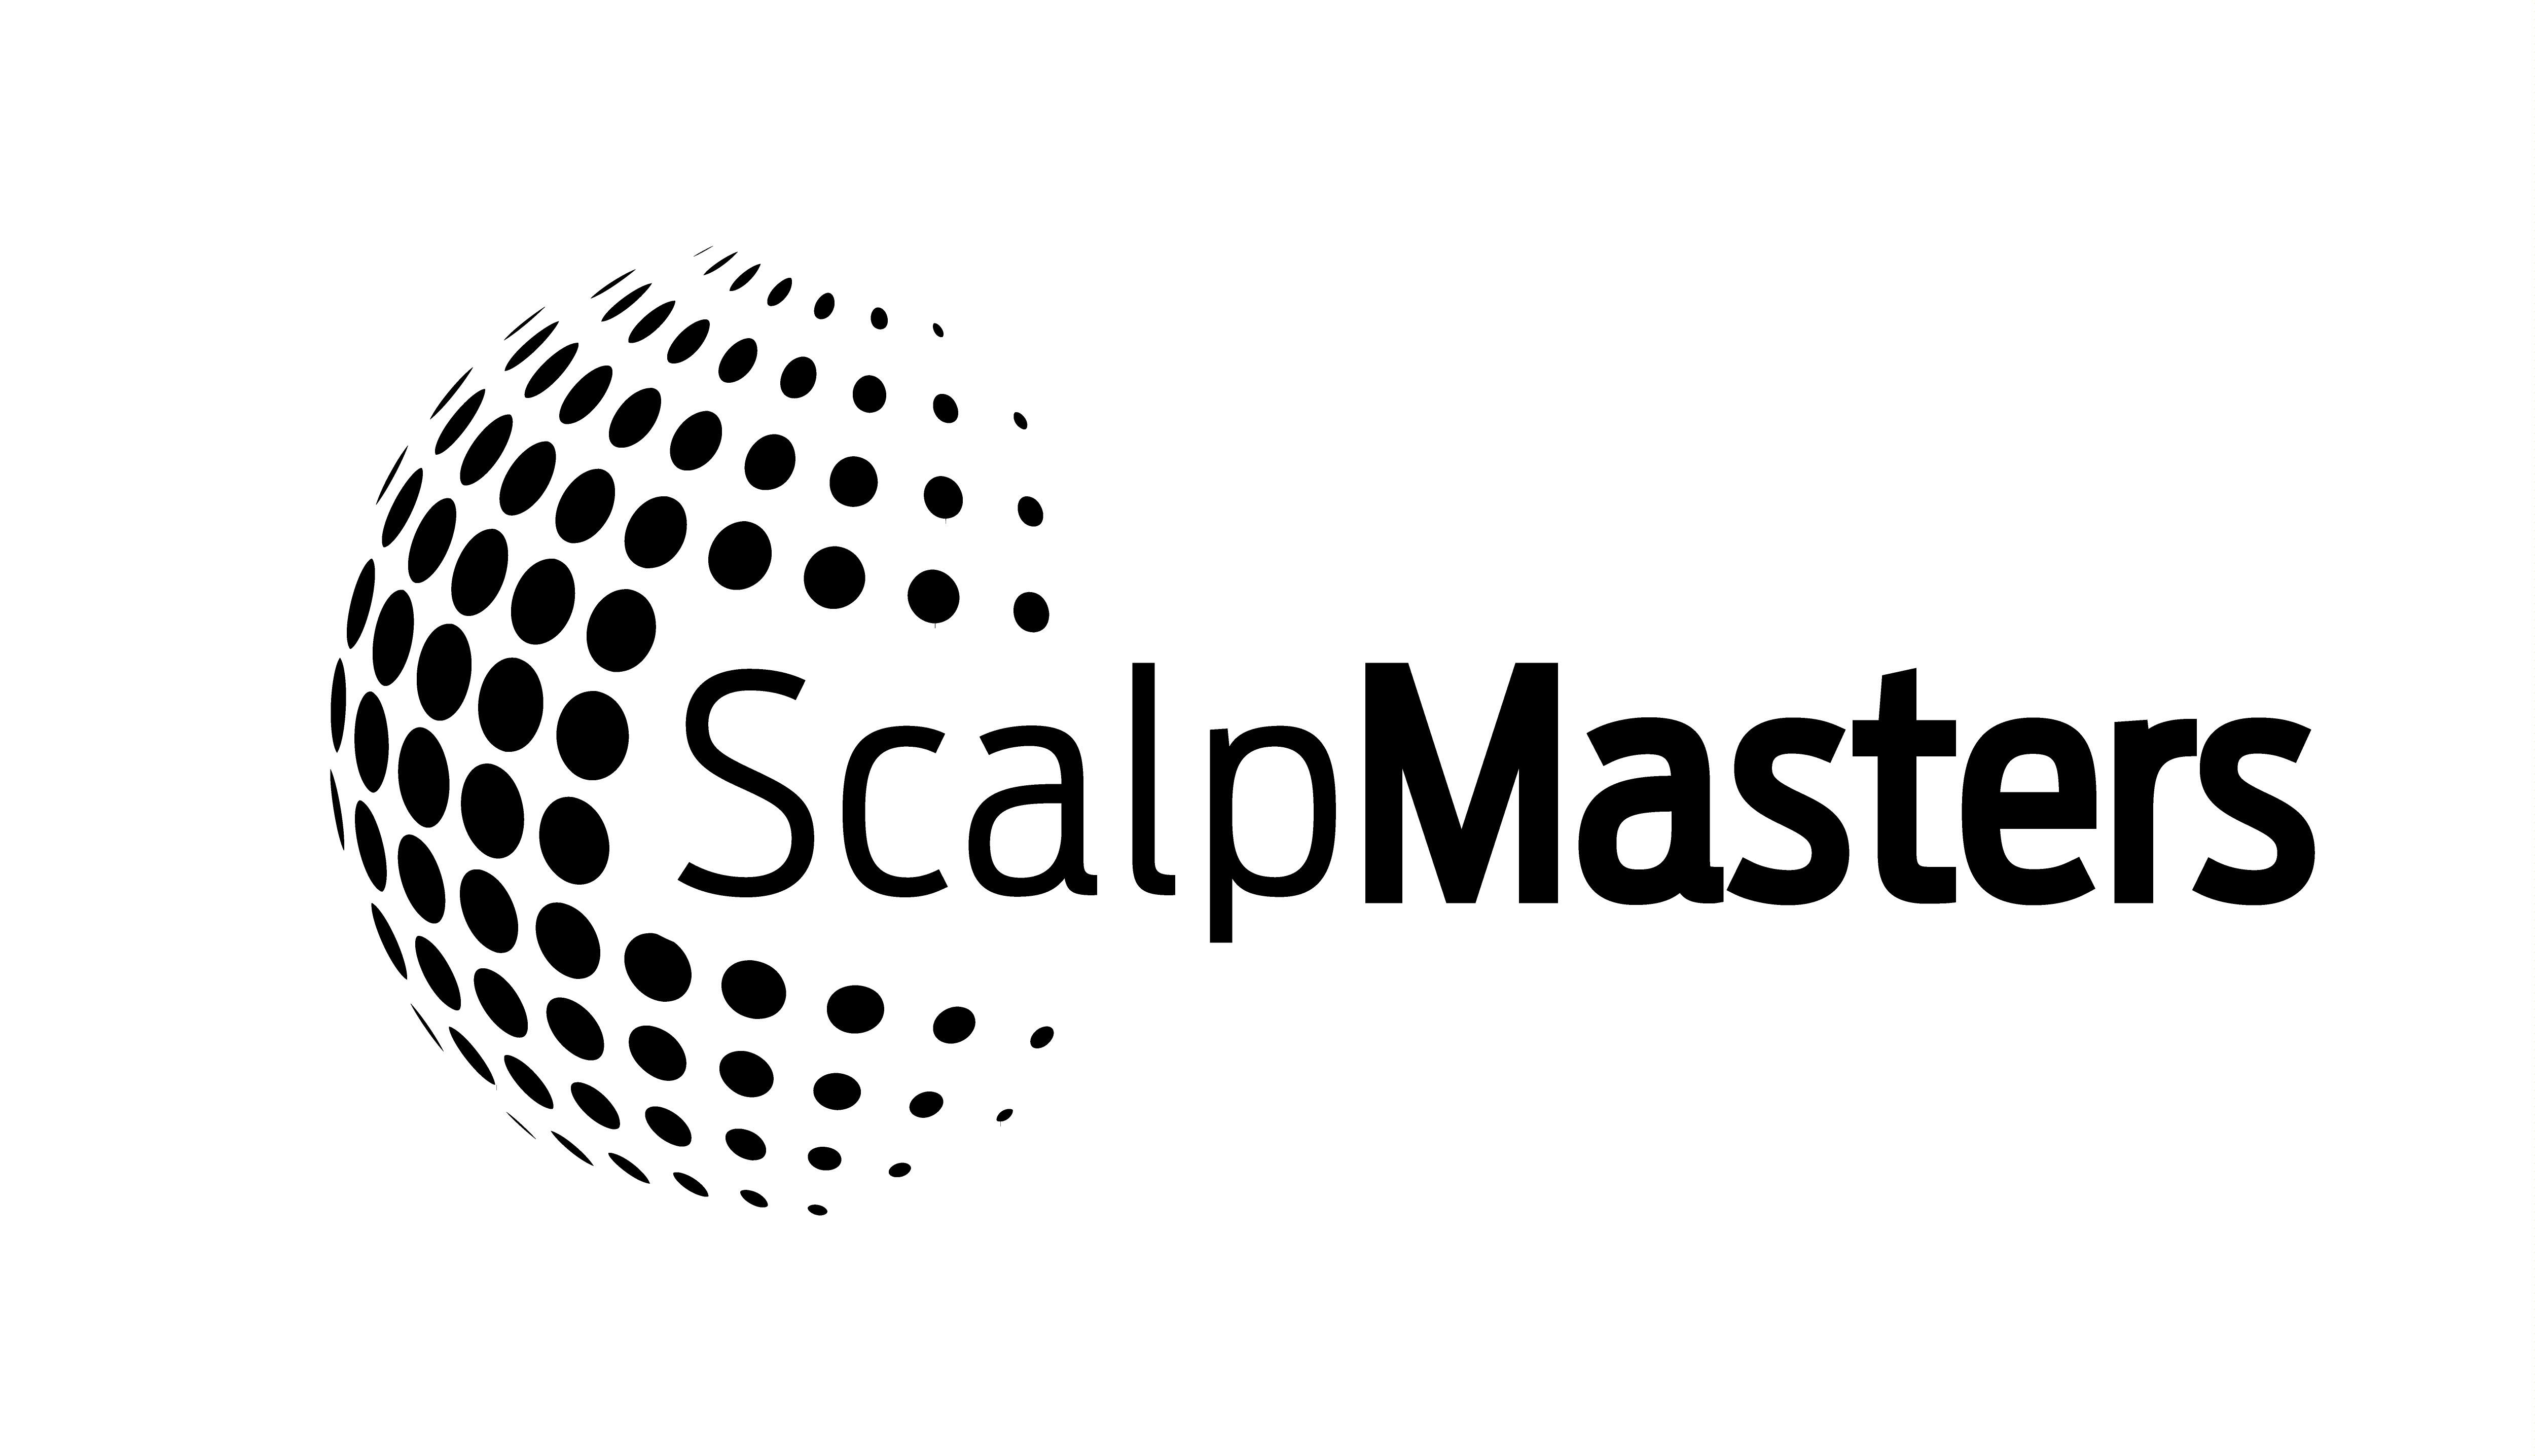 ScalpMasters-logo.jpg